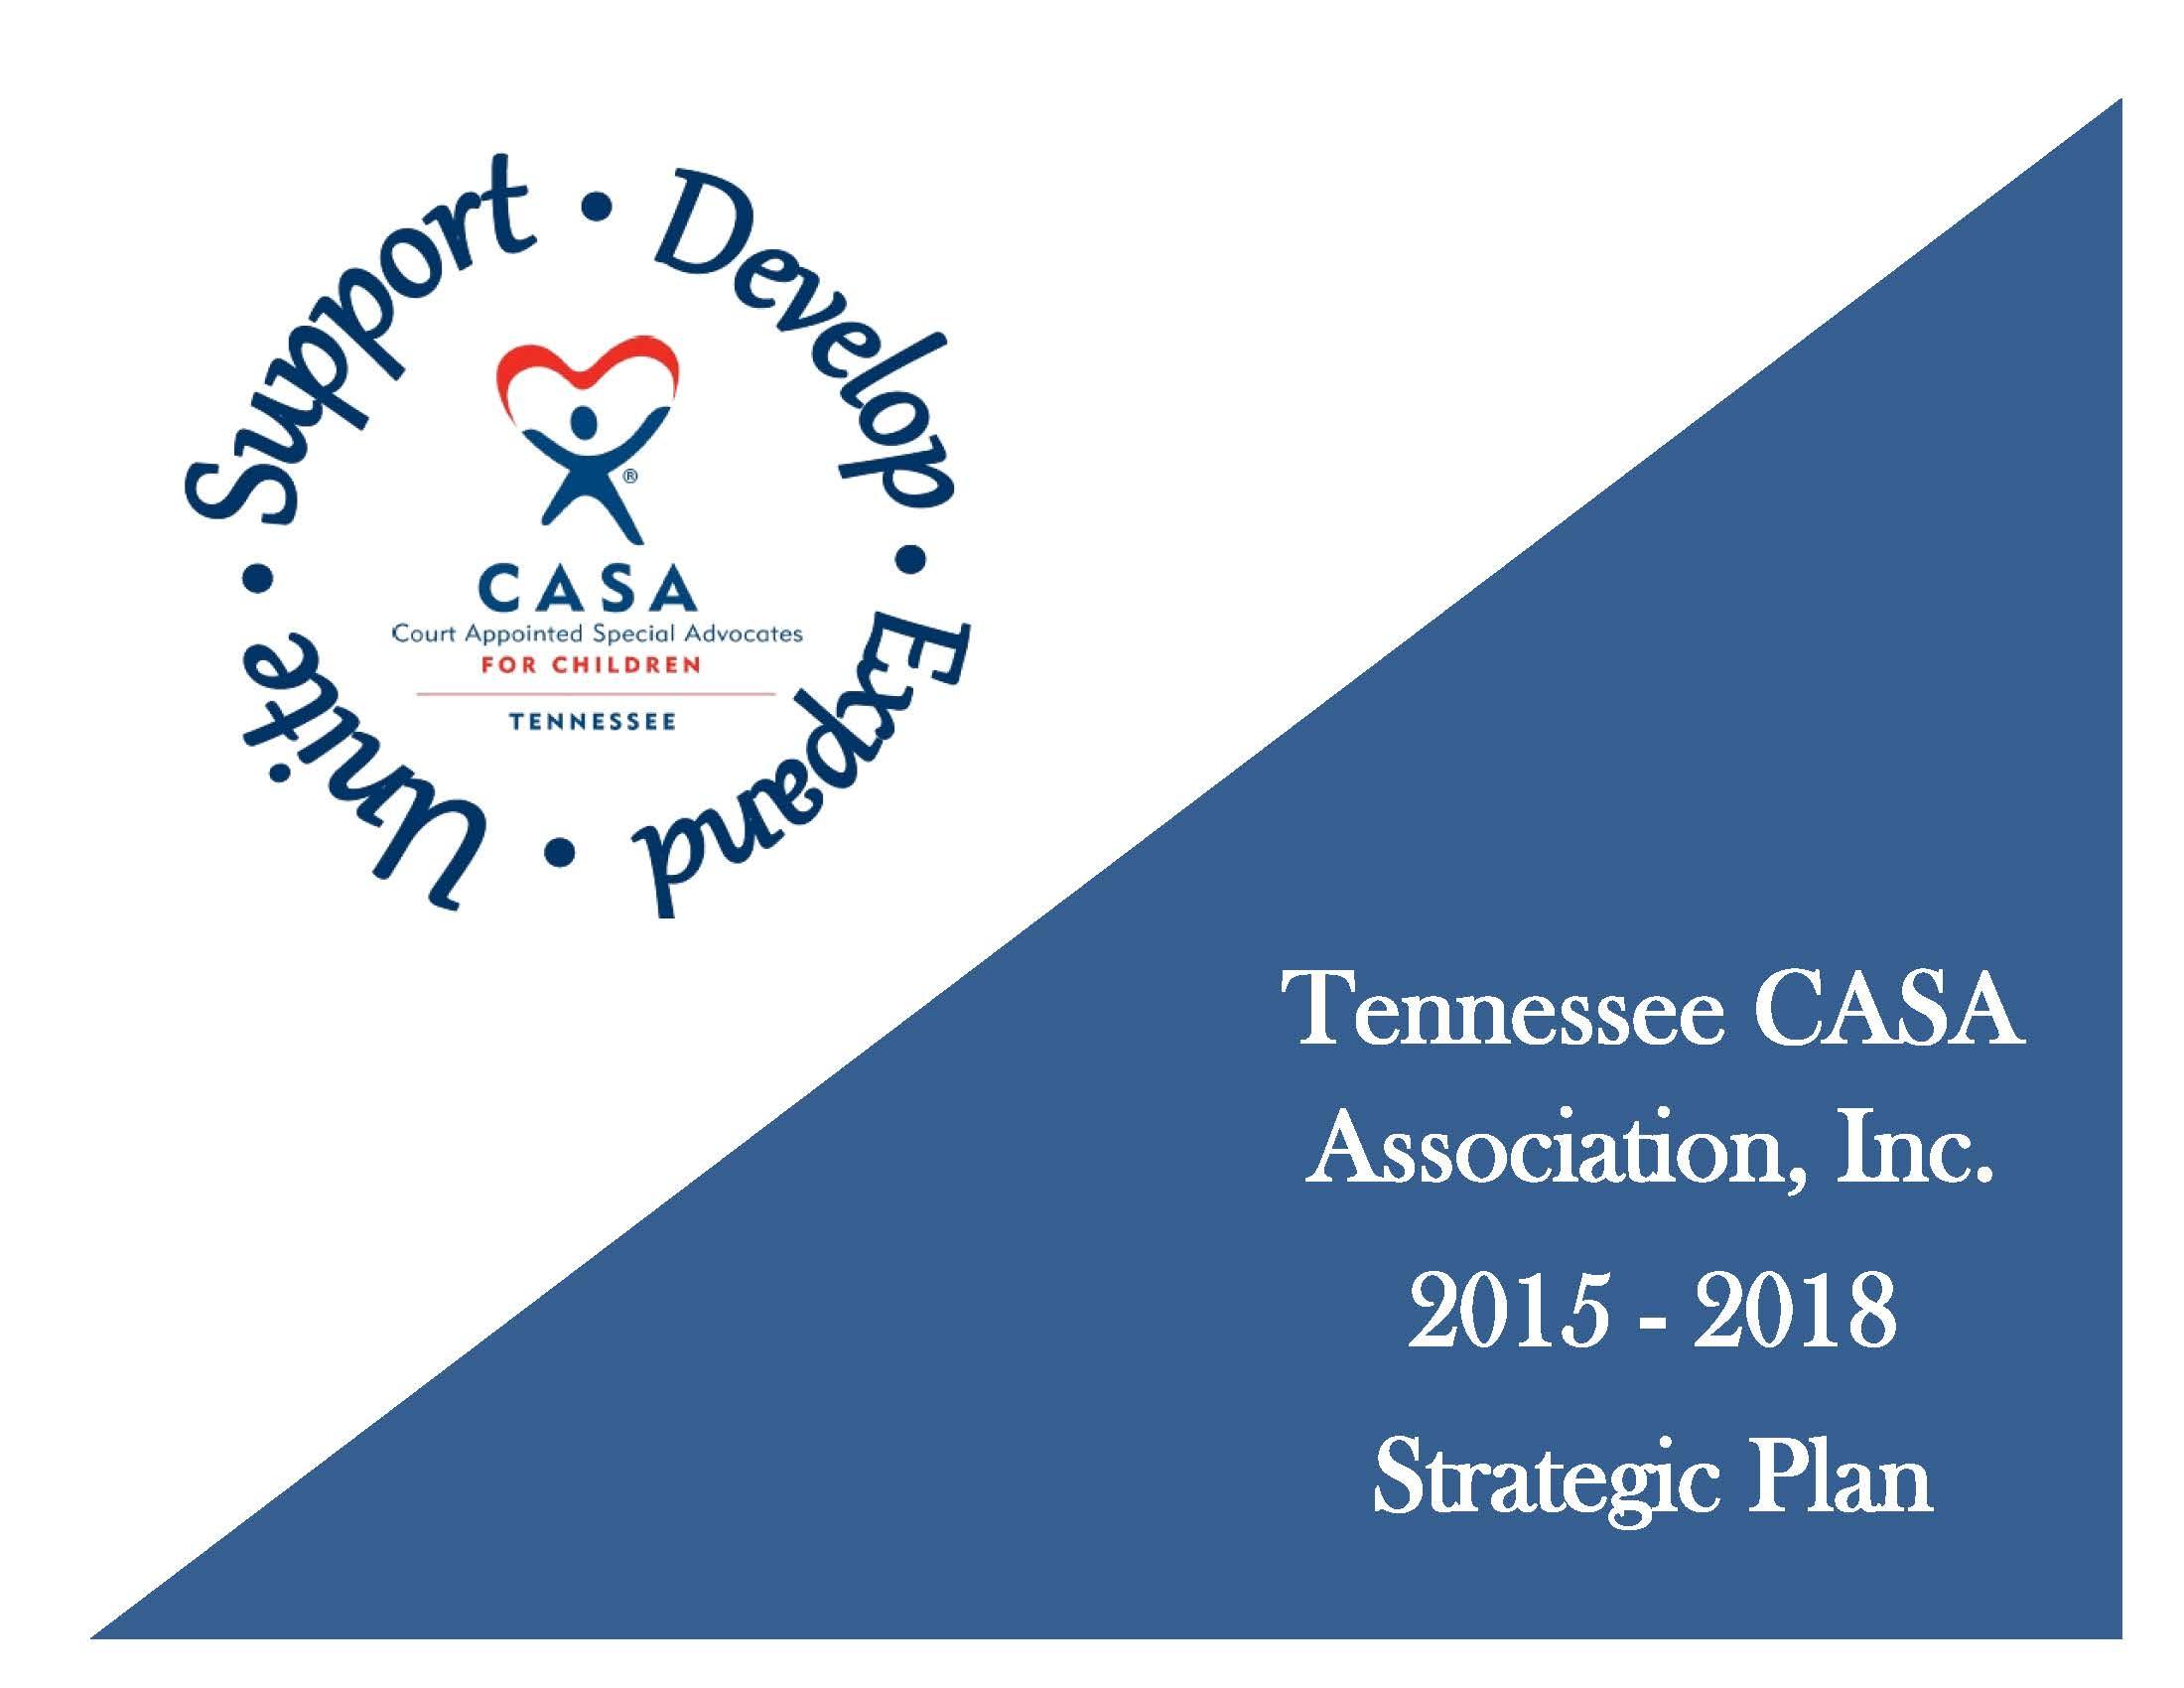 2015-2018 Strategic Plan